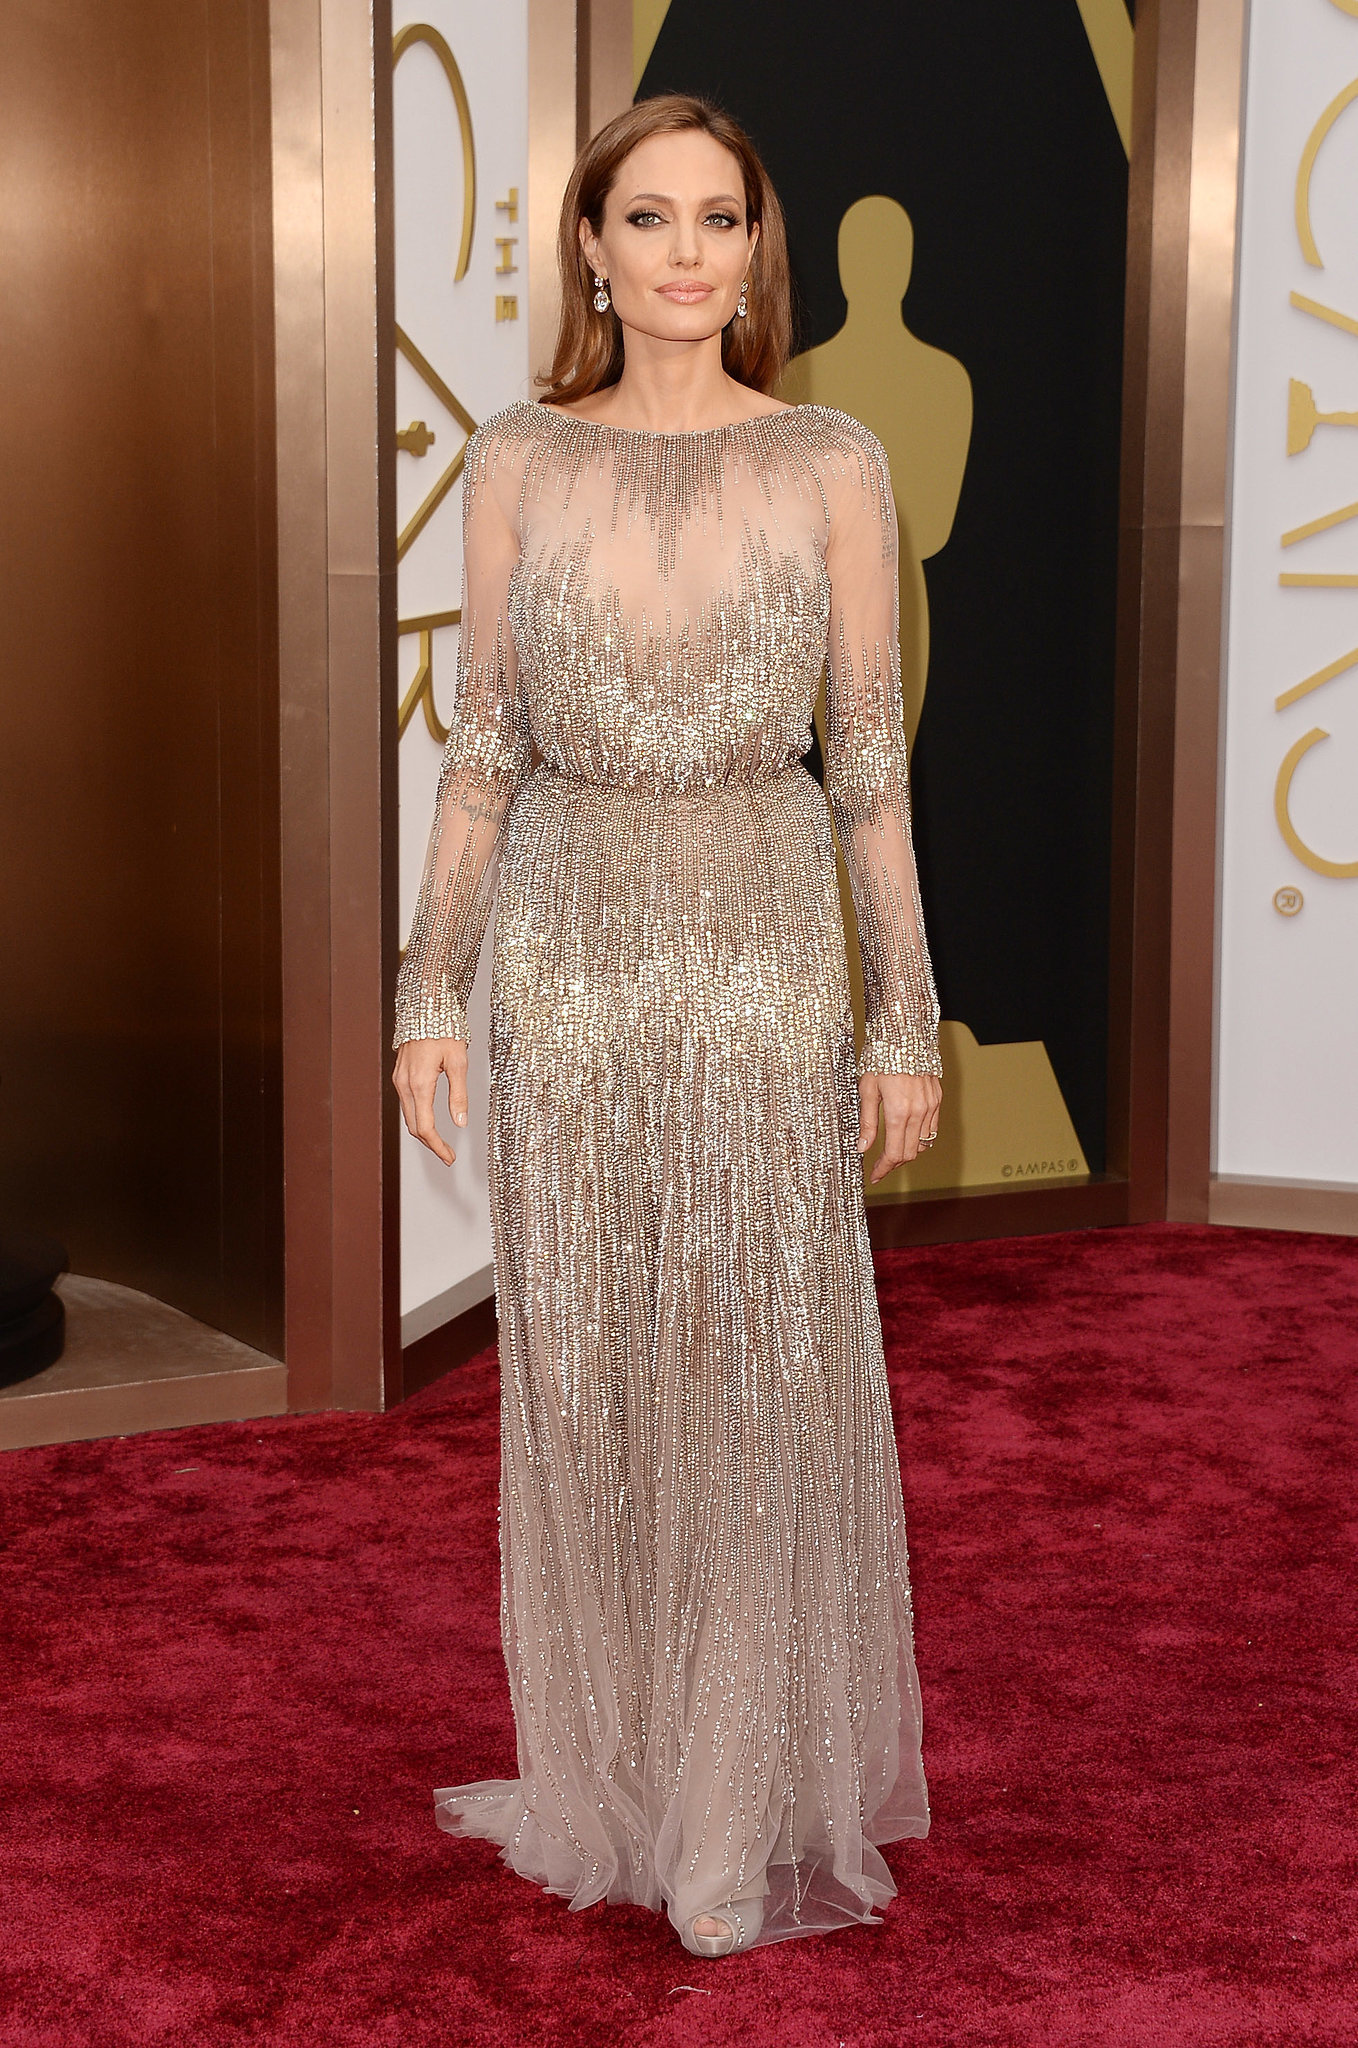 Angelina Jolie wearing Beige Sequin Evening Dress | Women\'s Fashion